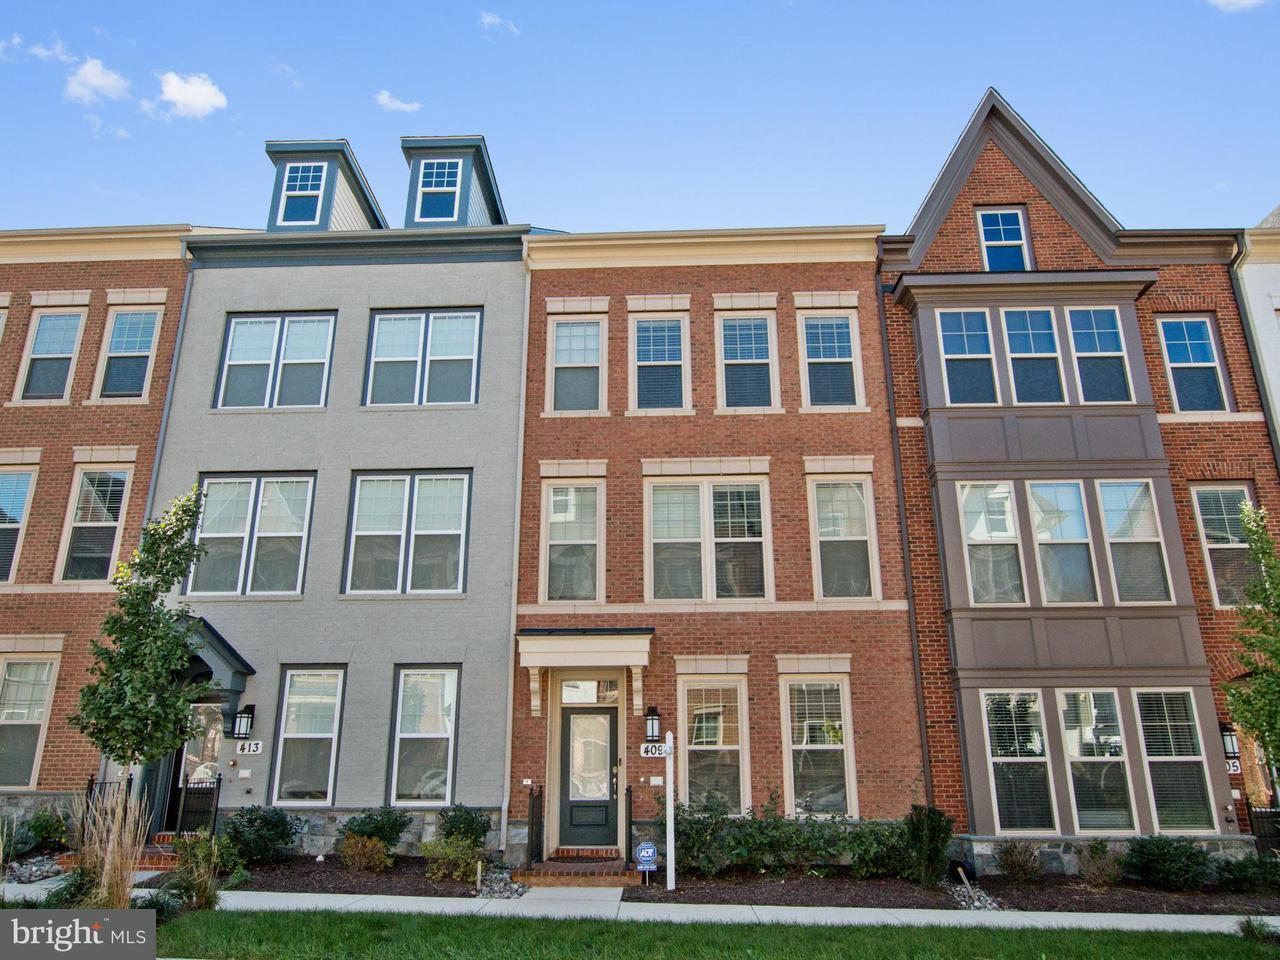 Townhouse for Sale at 409 HENDRIX Avenue 409 HENDRIX Avenue Gaithersburg, Maryland 20878 United States